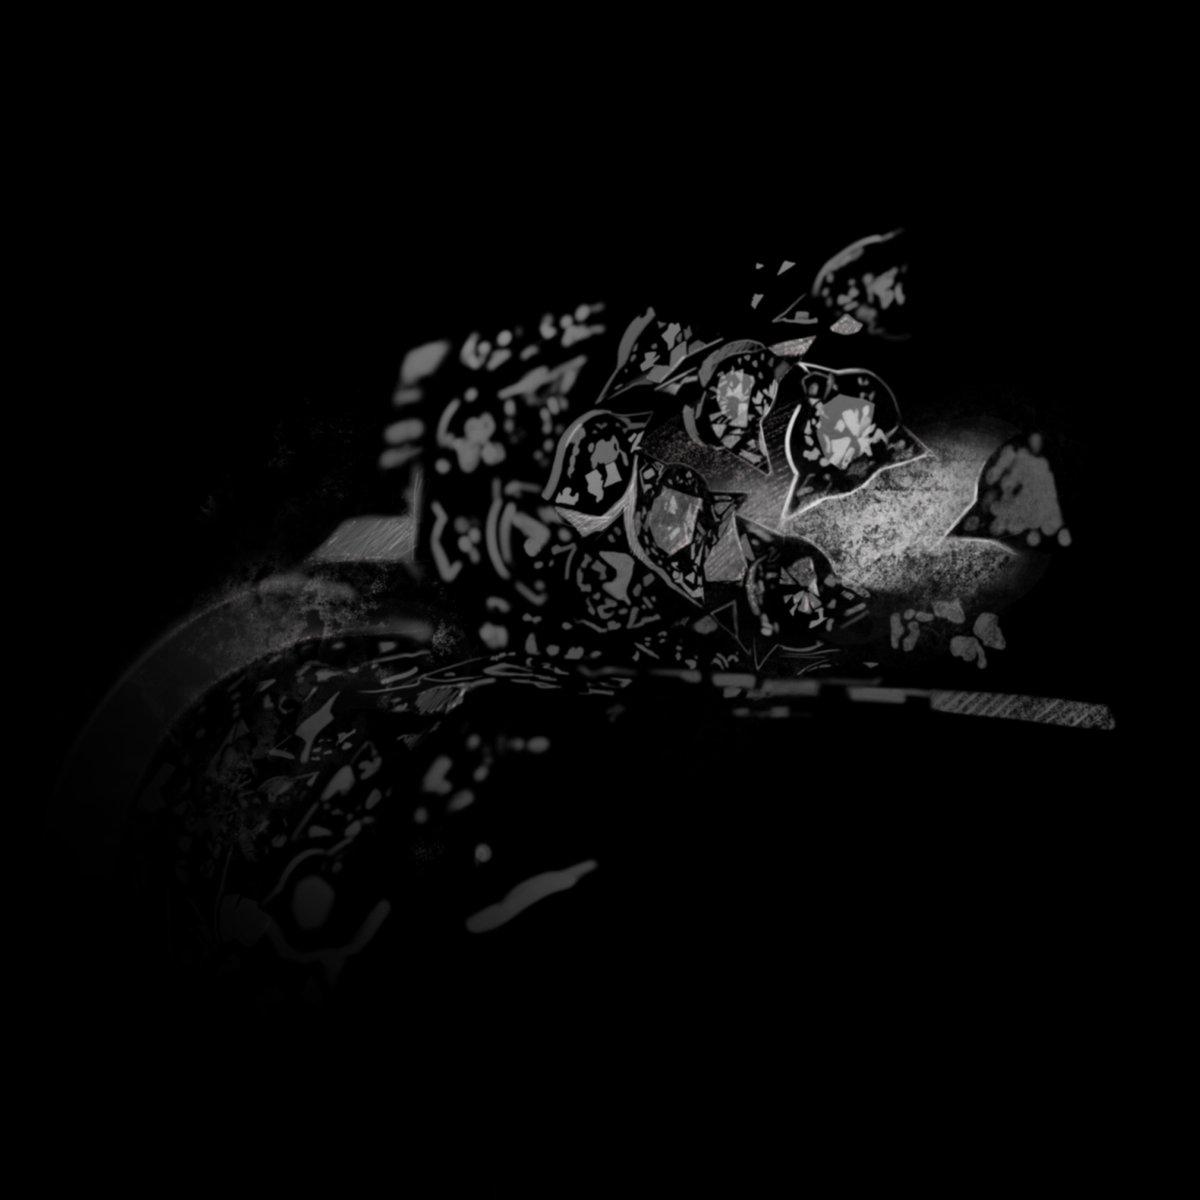 Creative Art #lepee_1839 #creativity #watchmaking https://t.co/62VtKGQ0nh